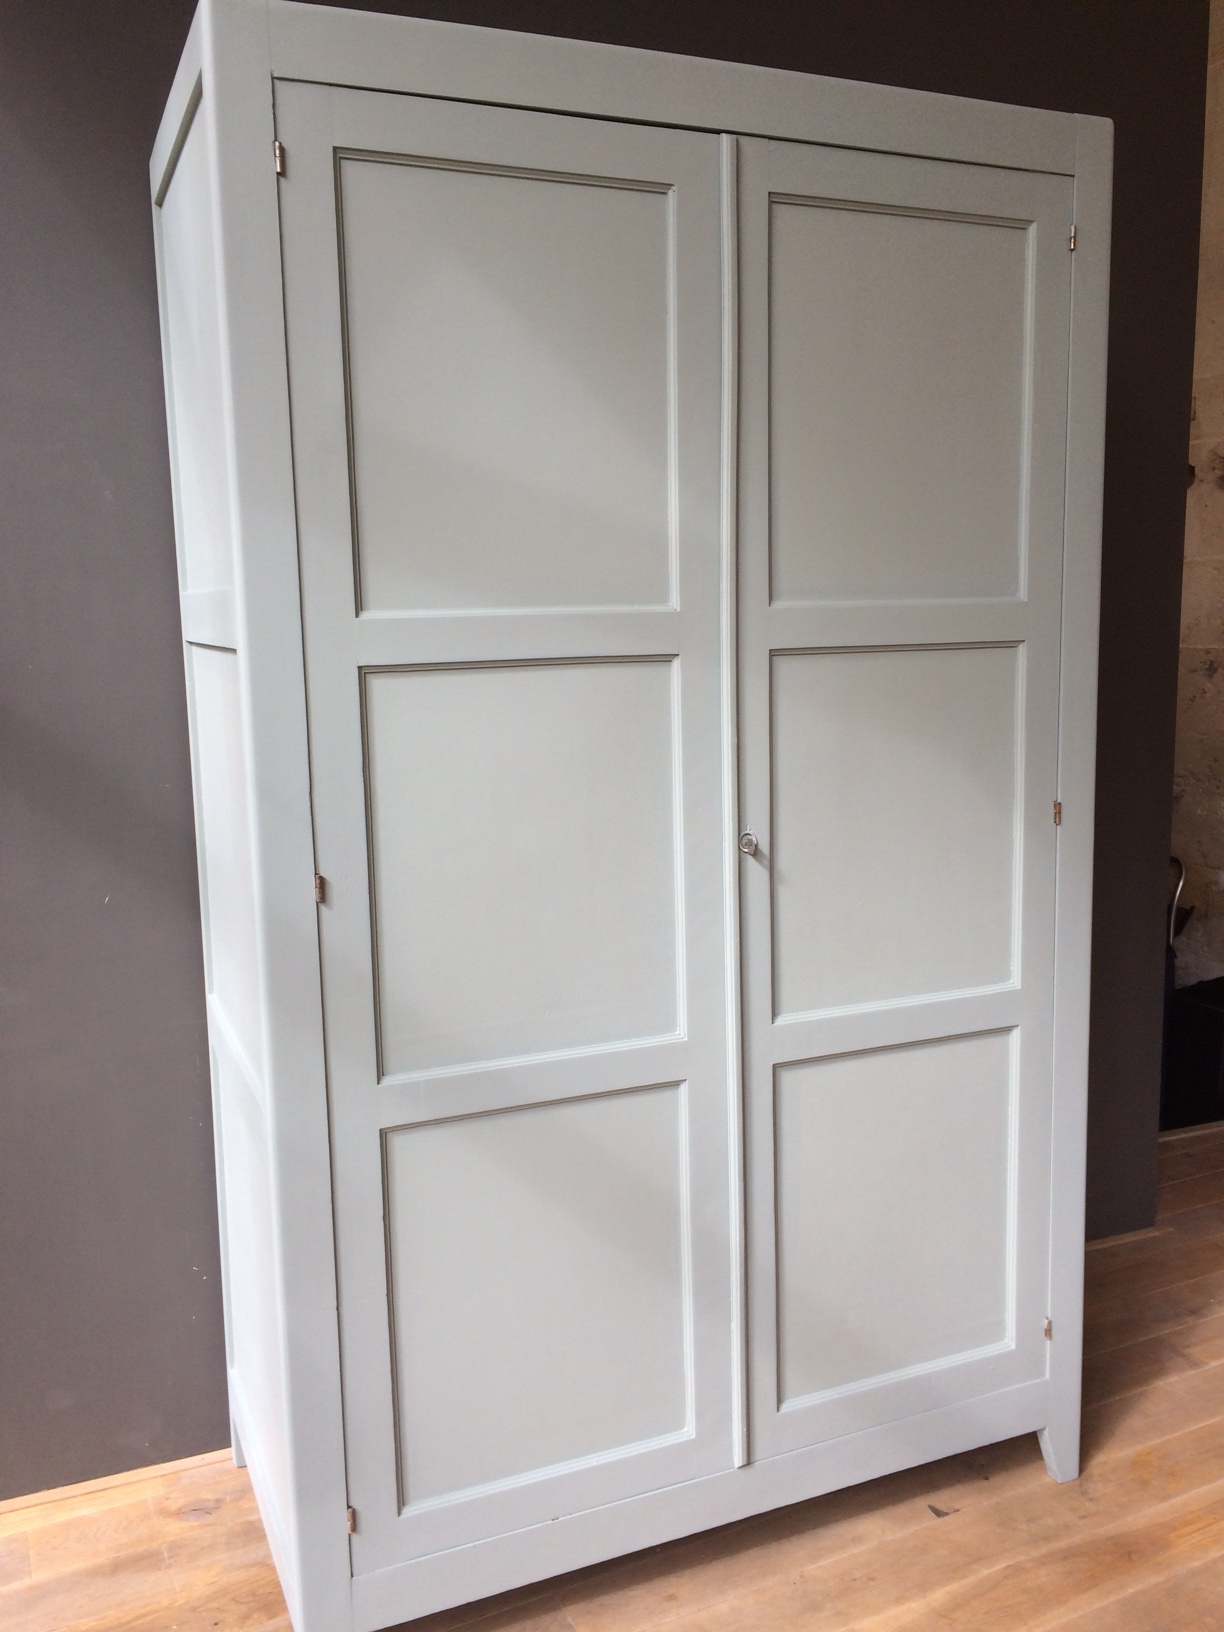 armoire parisienne penderie petite belette. Black Bedroom Furniture Sets. Home Design Ideas